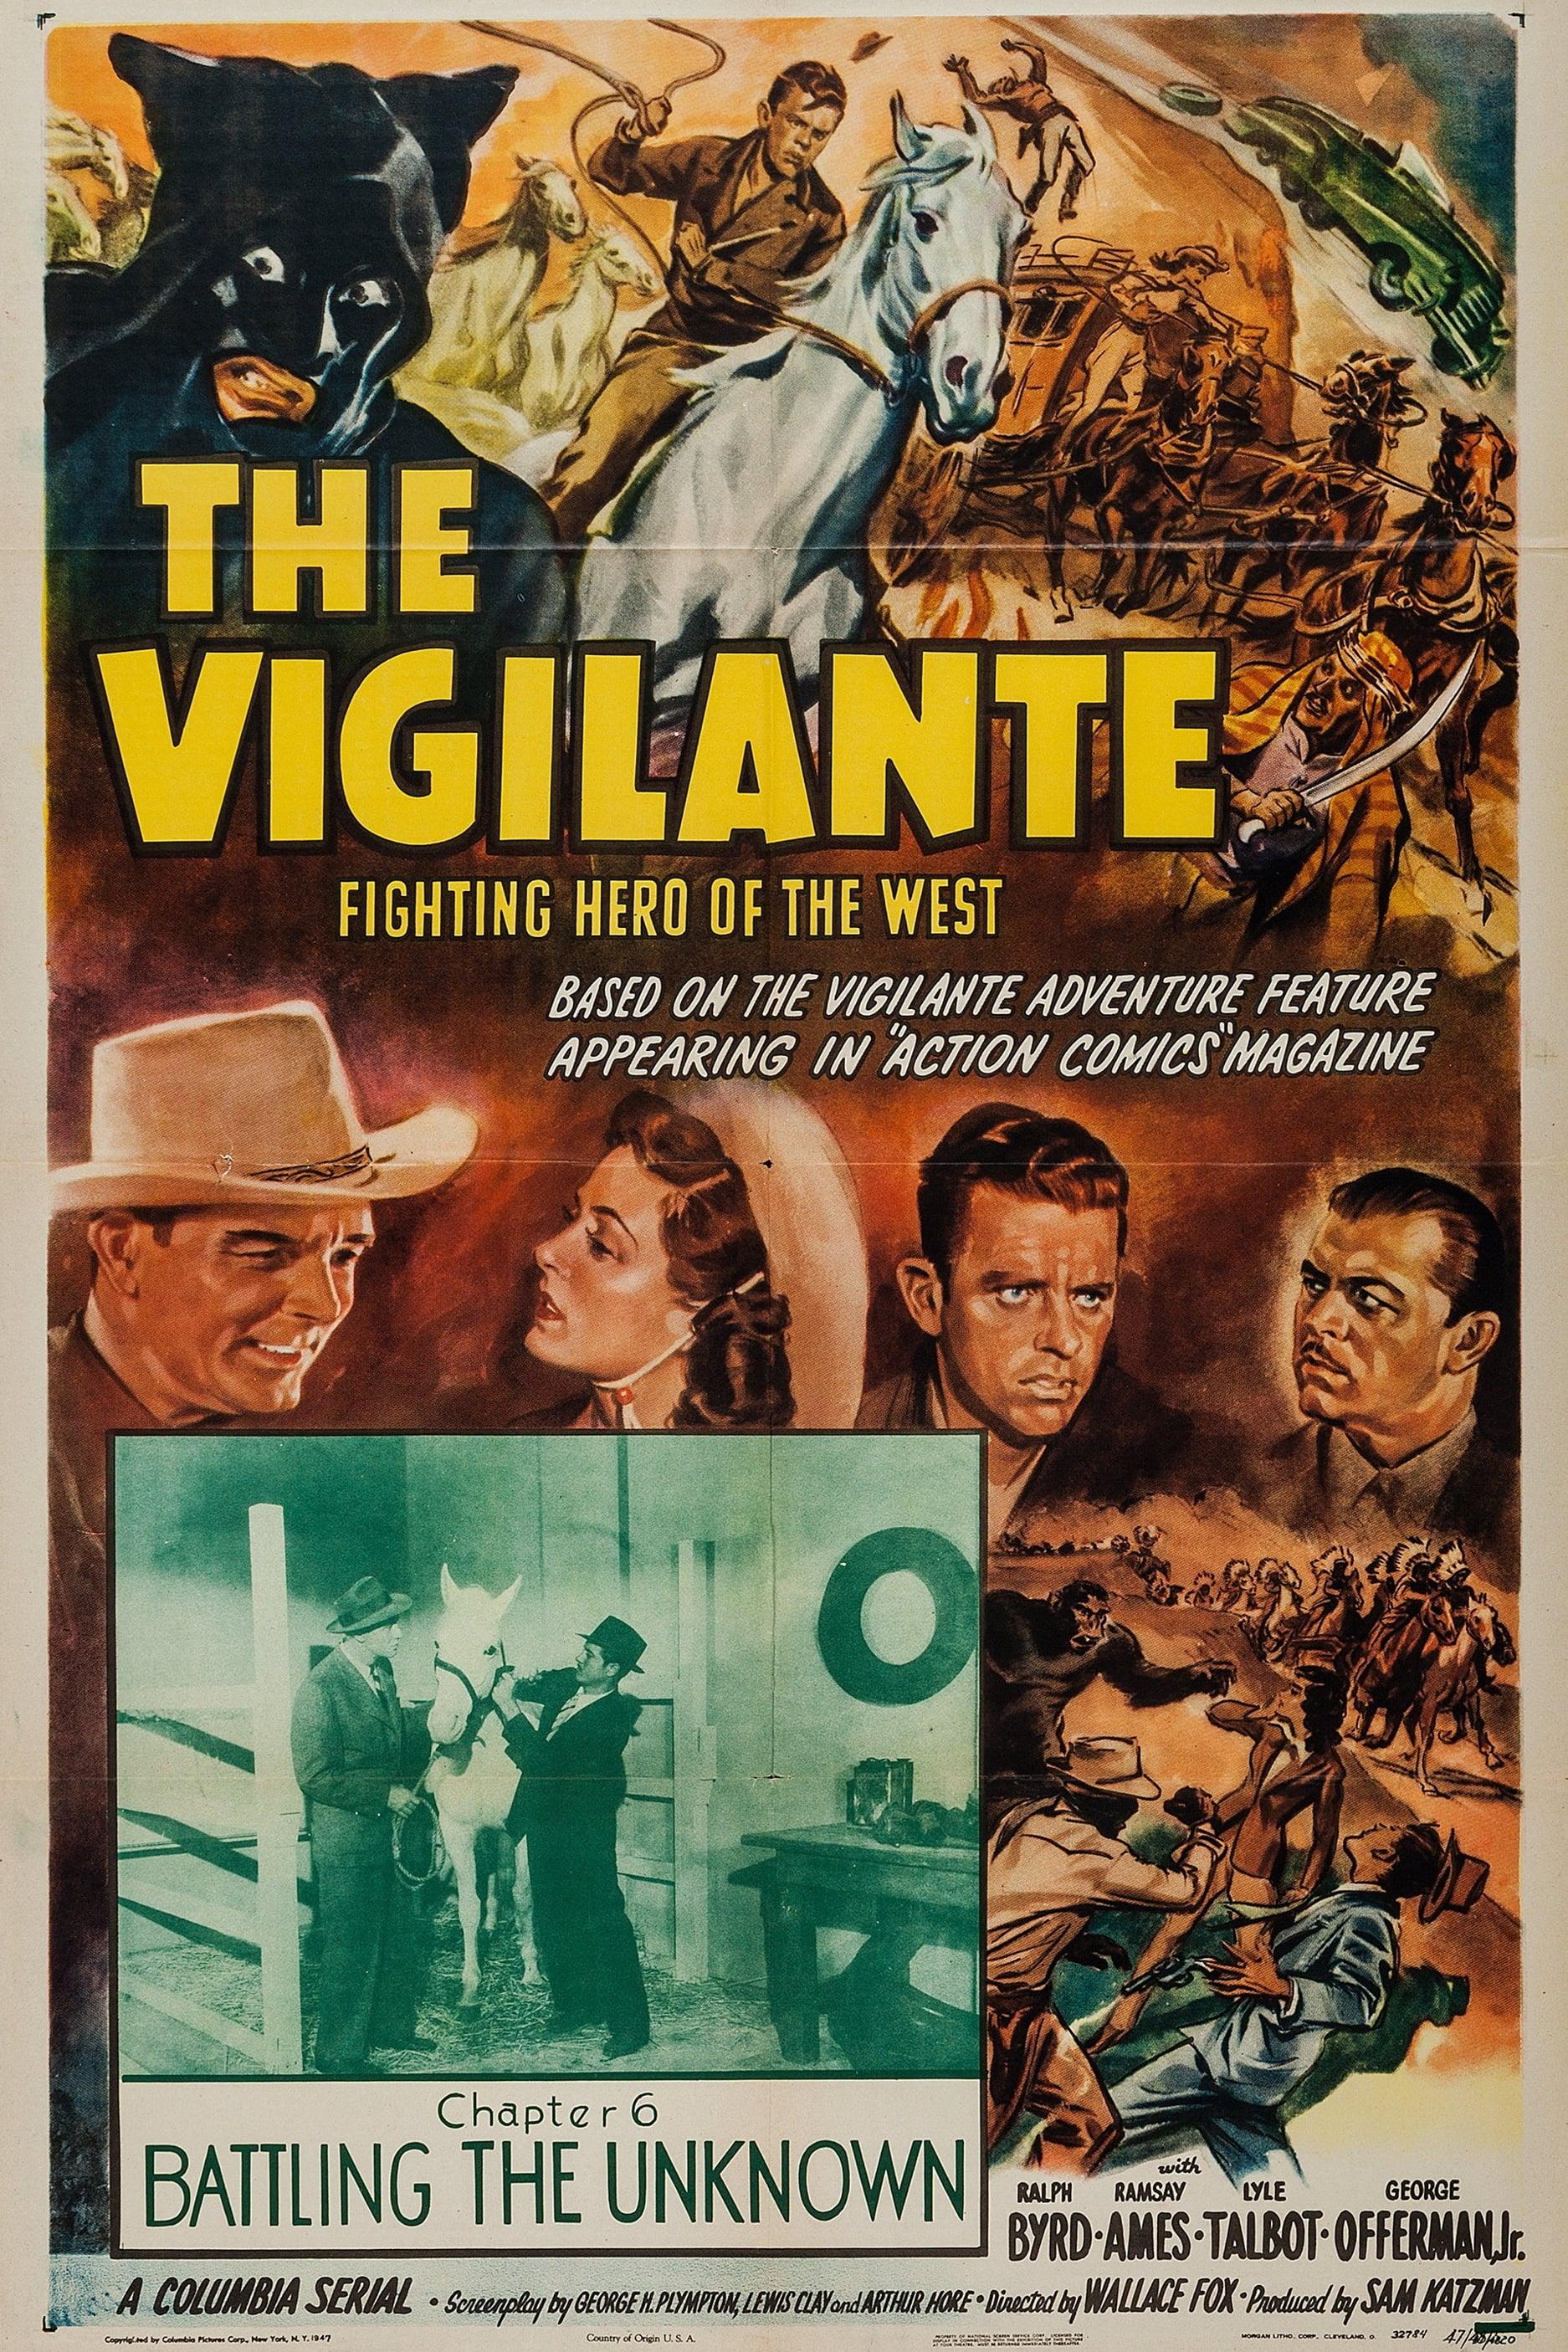 The Vigilante: Fighting Hero of the West